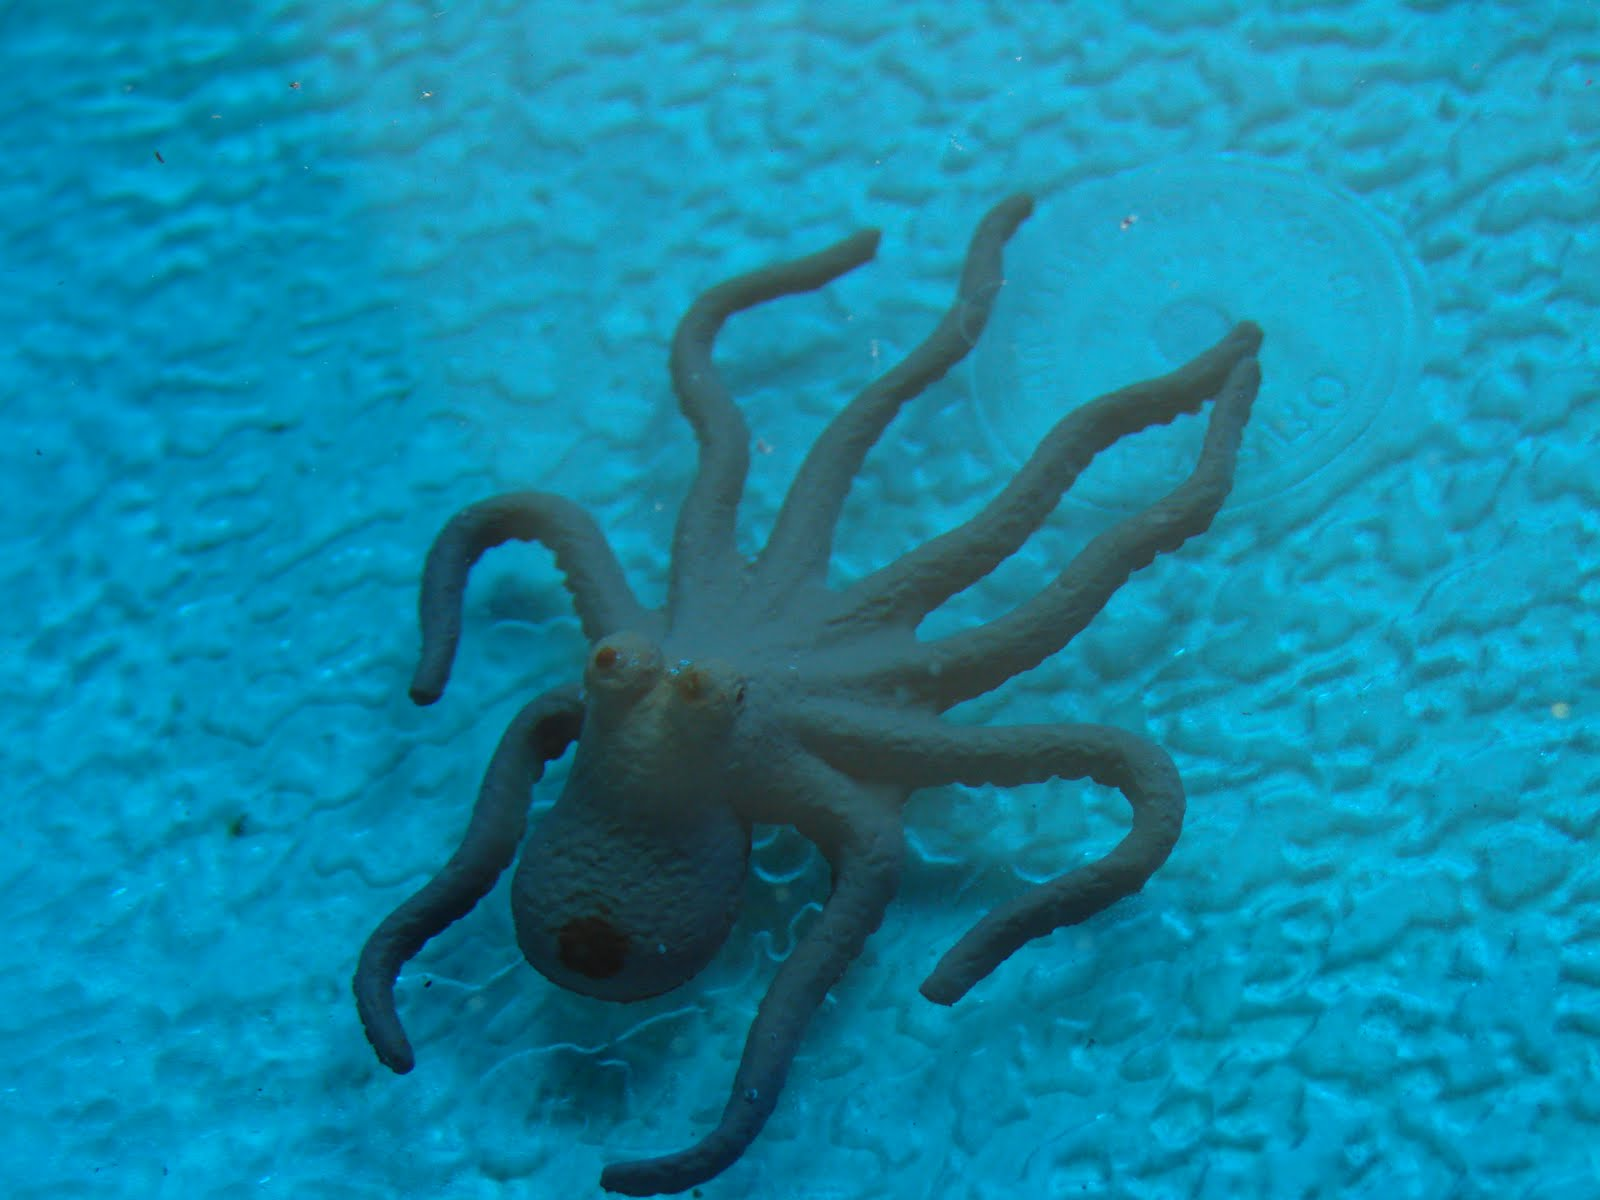 Octopus UnderwaterUnderwater Octopus